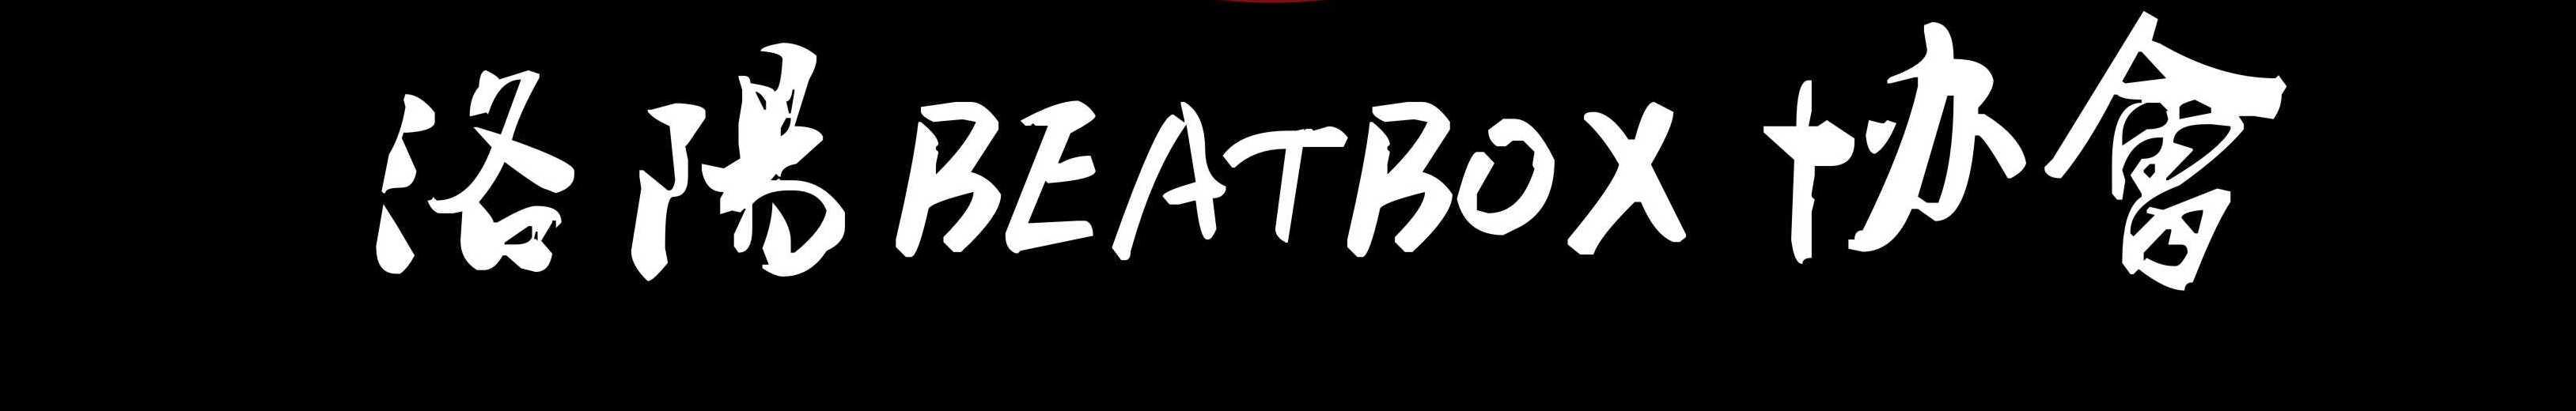 Beatbox付森 banner